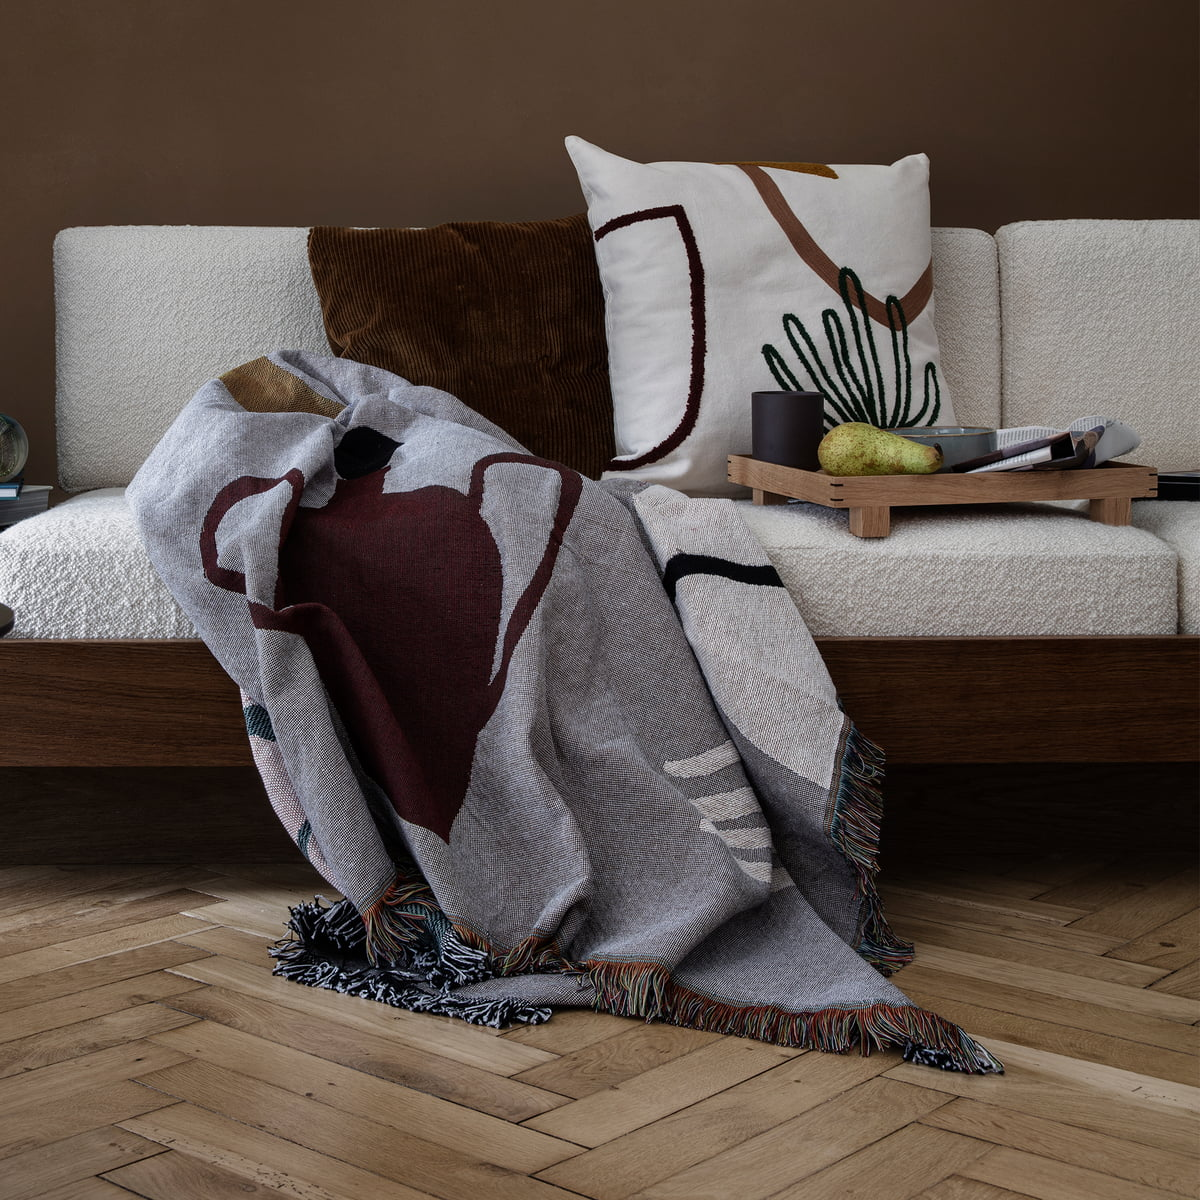 mirage kissen von ferm living connox. Black Bedroom Furniture Sets. Home Design Ideas